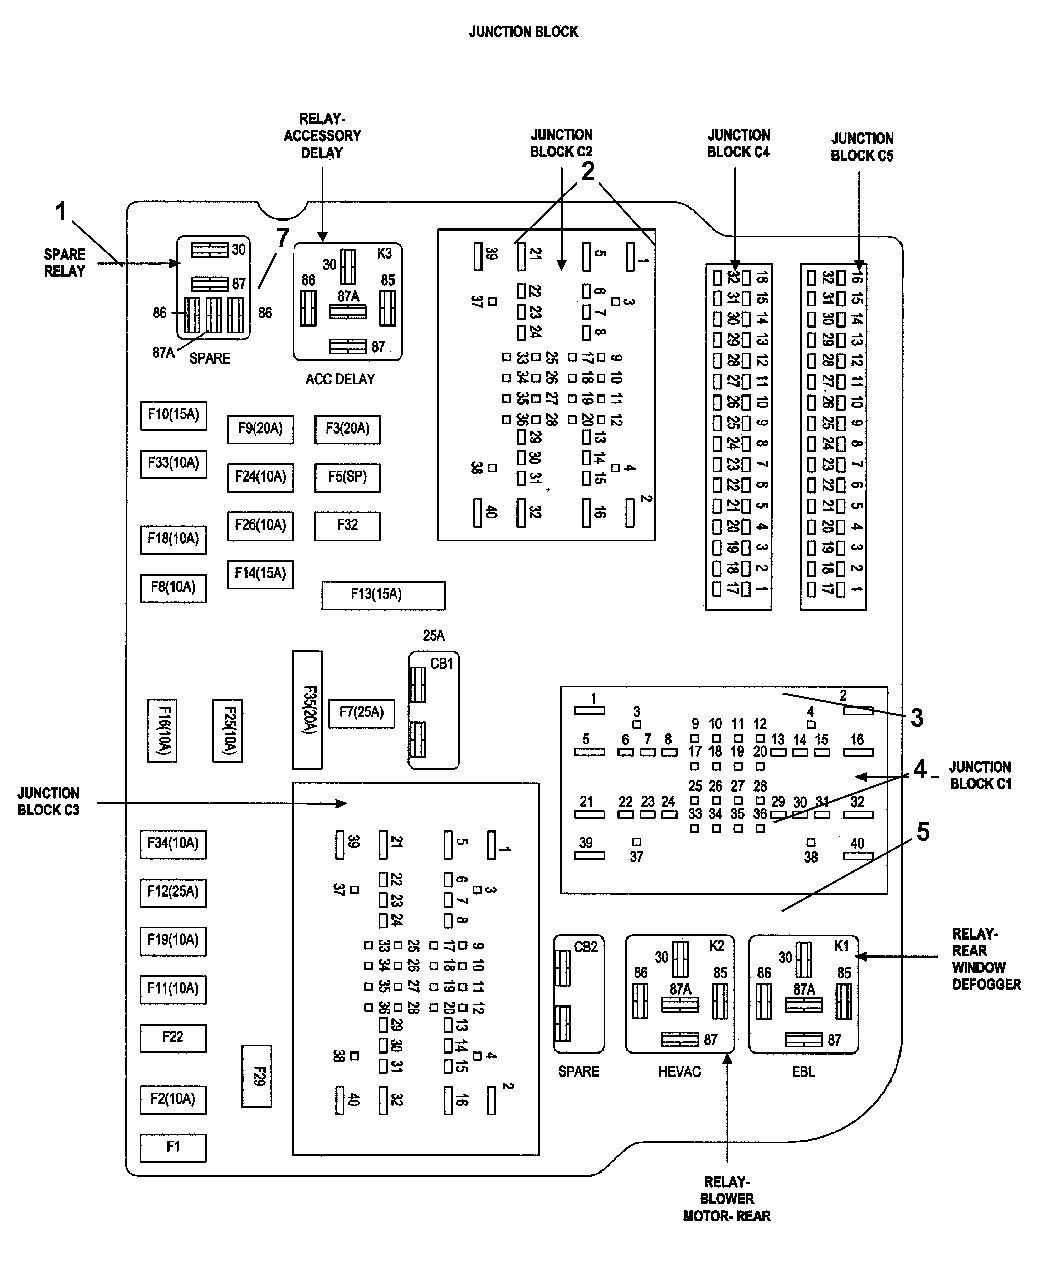 2009 Jeep Commander Fuse Box Diagram